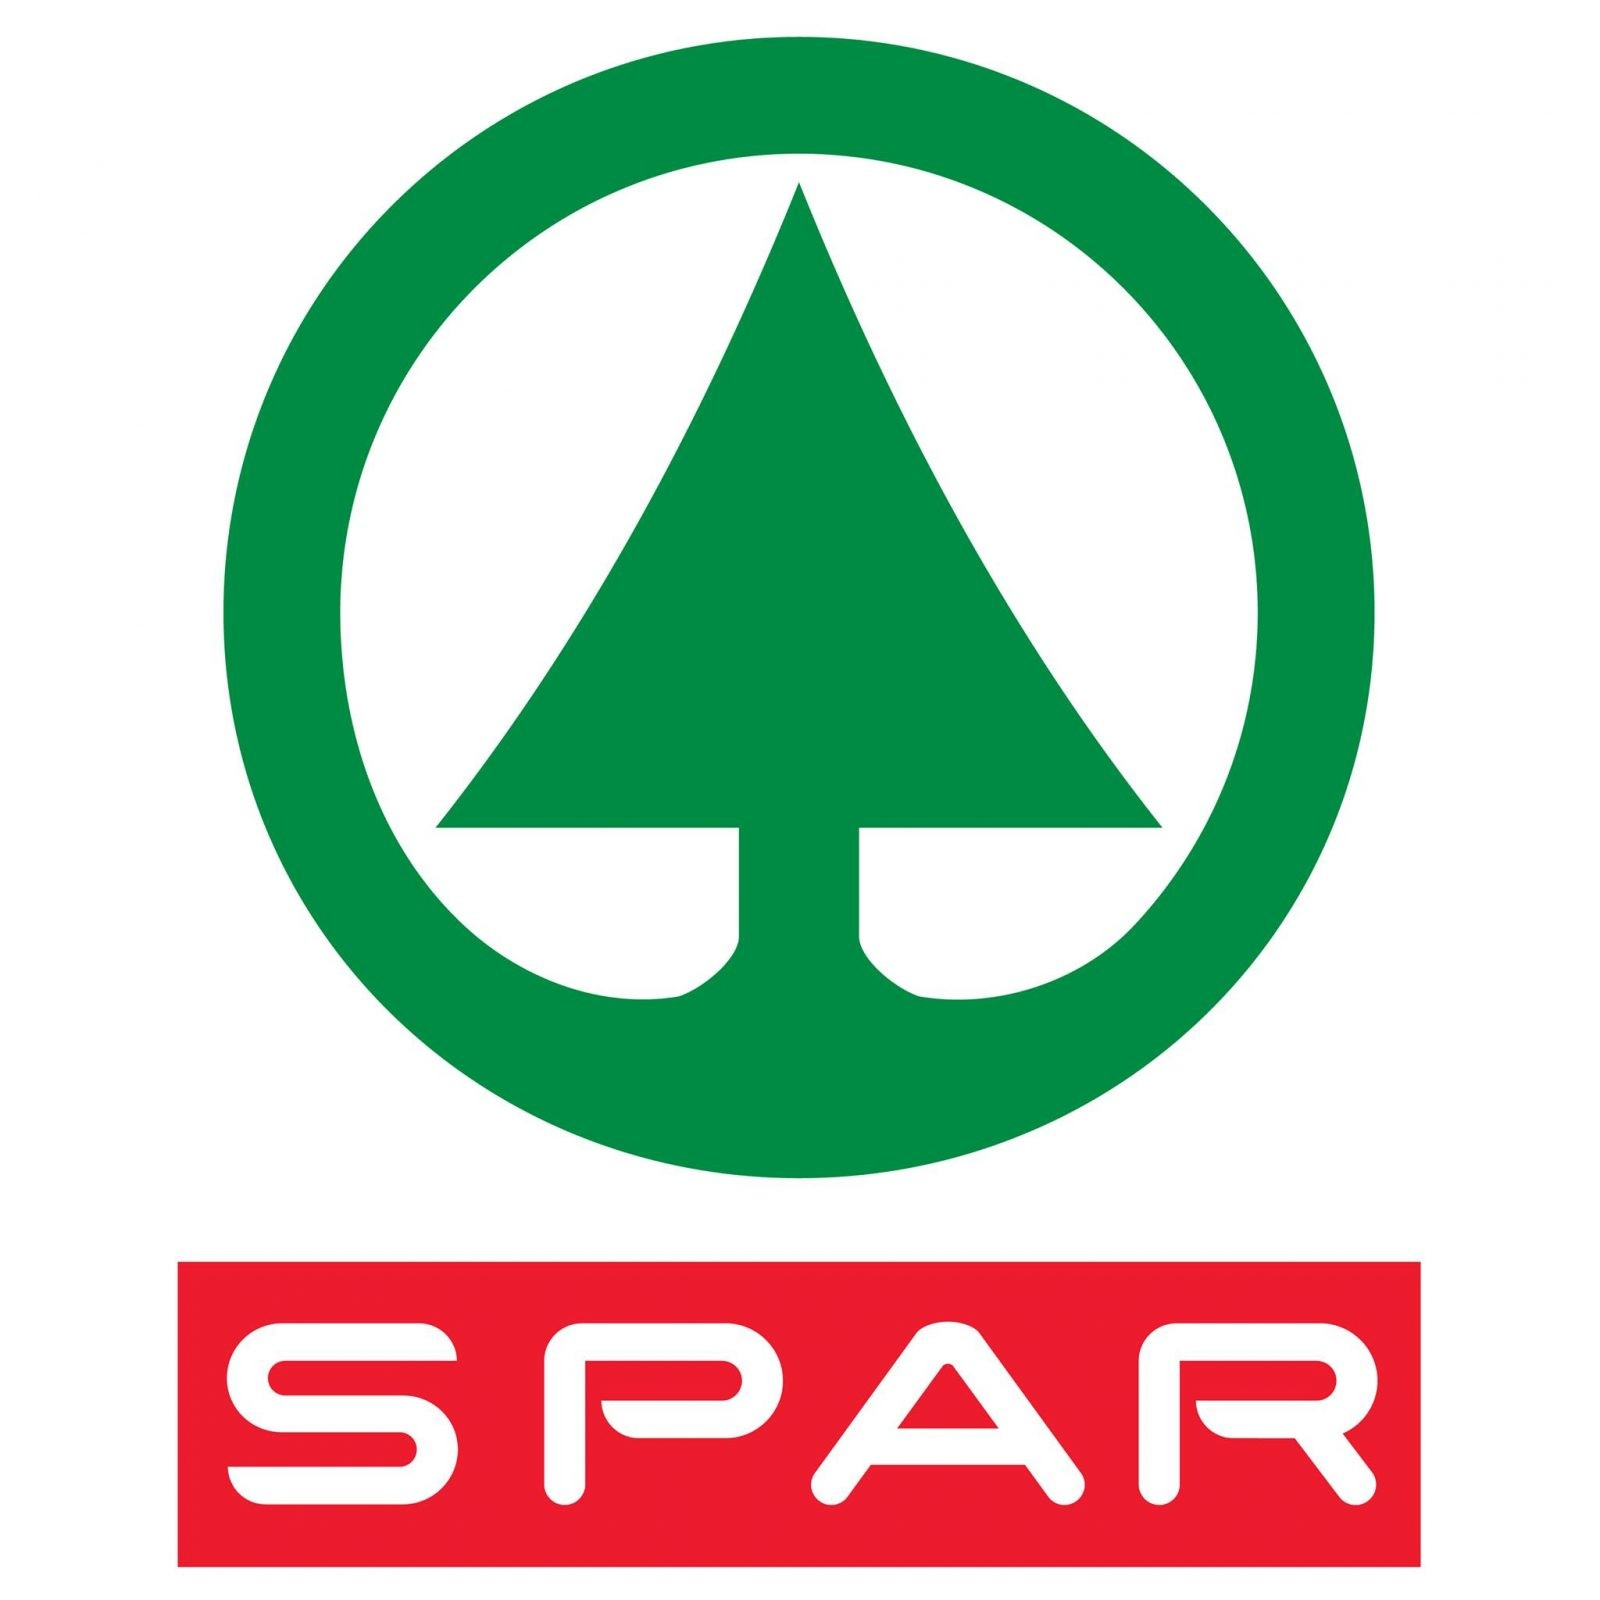 Stores Fuse Systems Retail Spar -